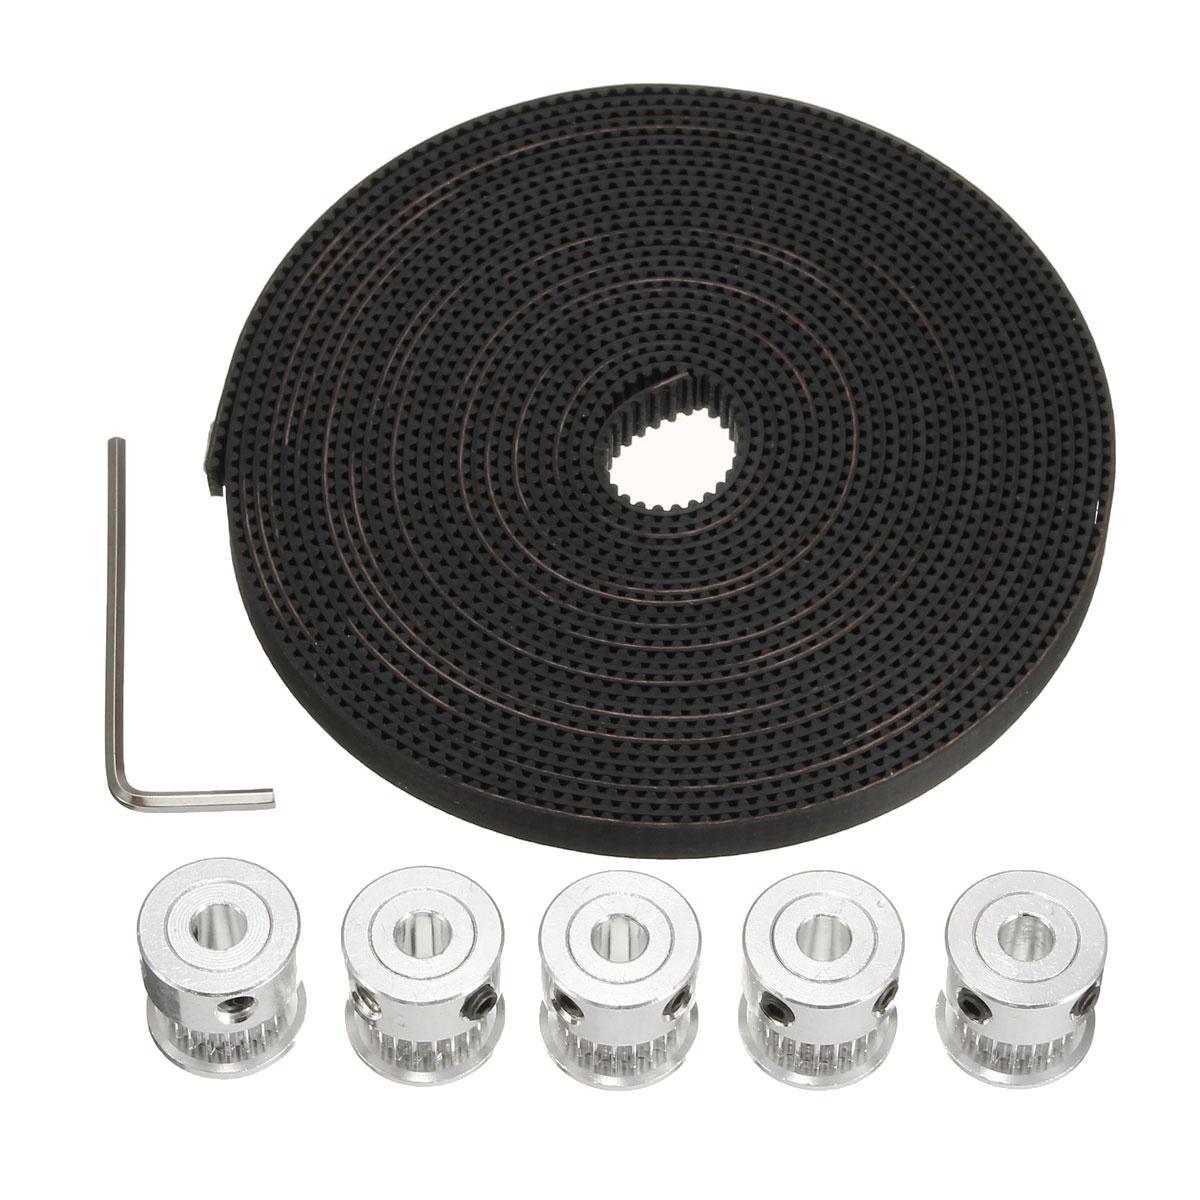 GT2 20 Tooth Timing Pulleys And 5 Meters Of GT2 Belt 3D Printing Reprap S7